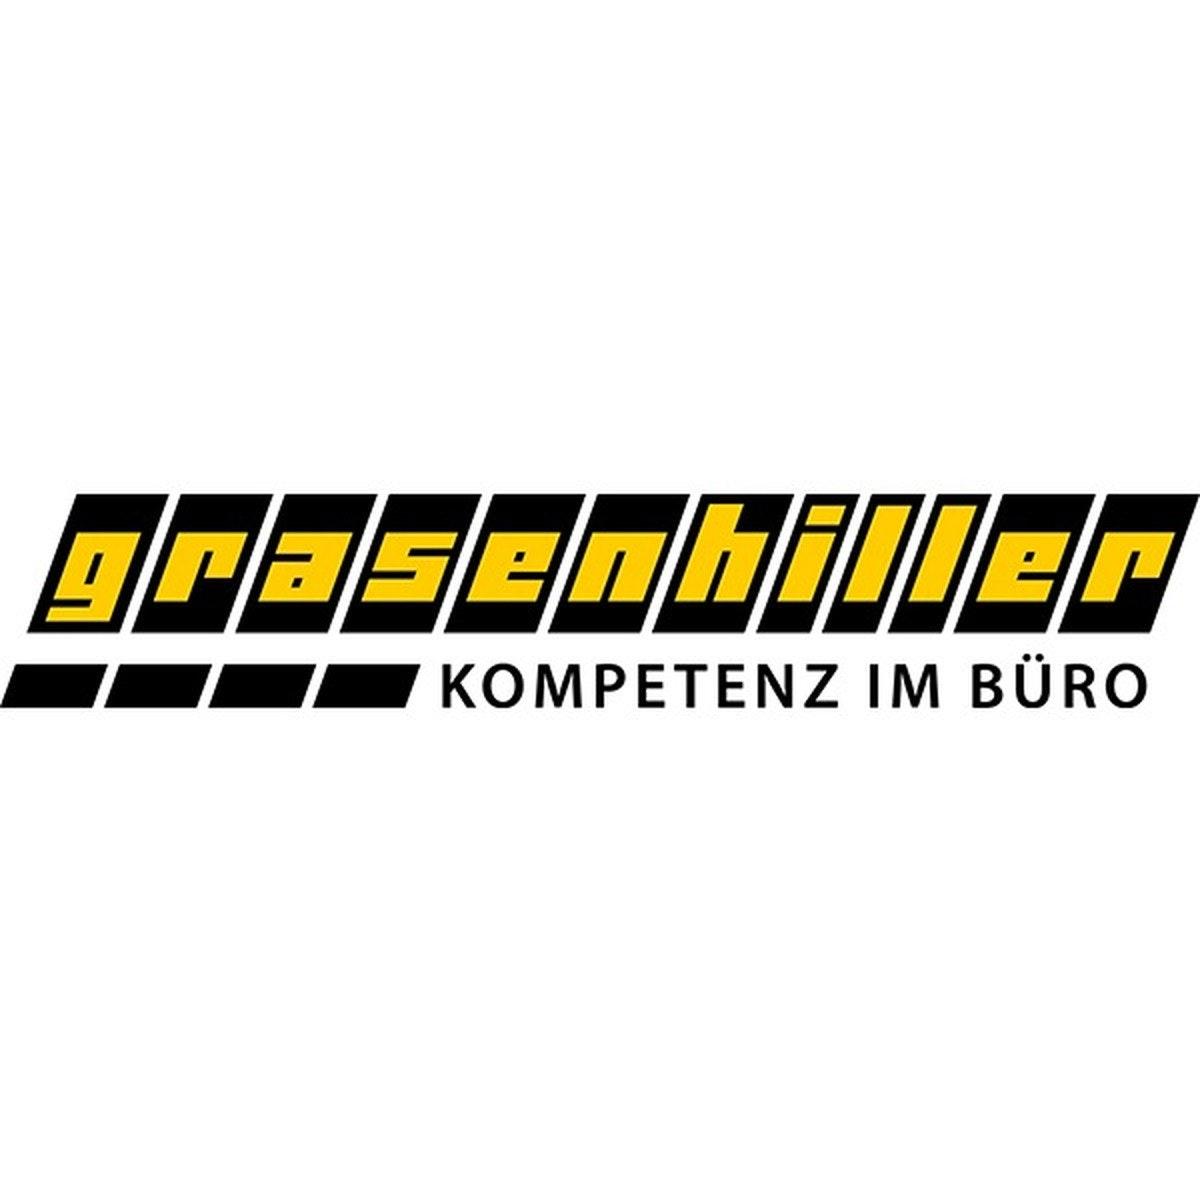 Grasenhiller GmbH